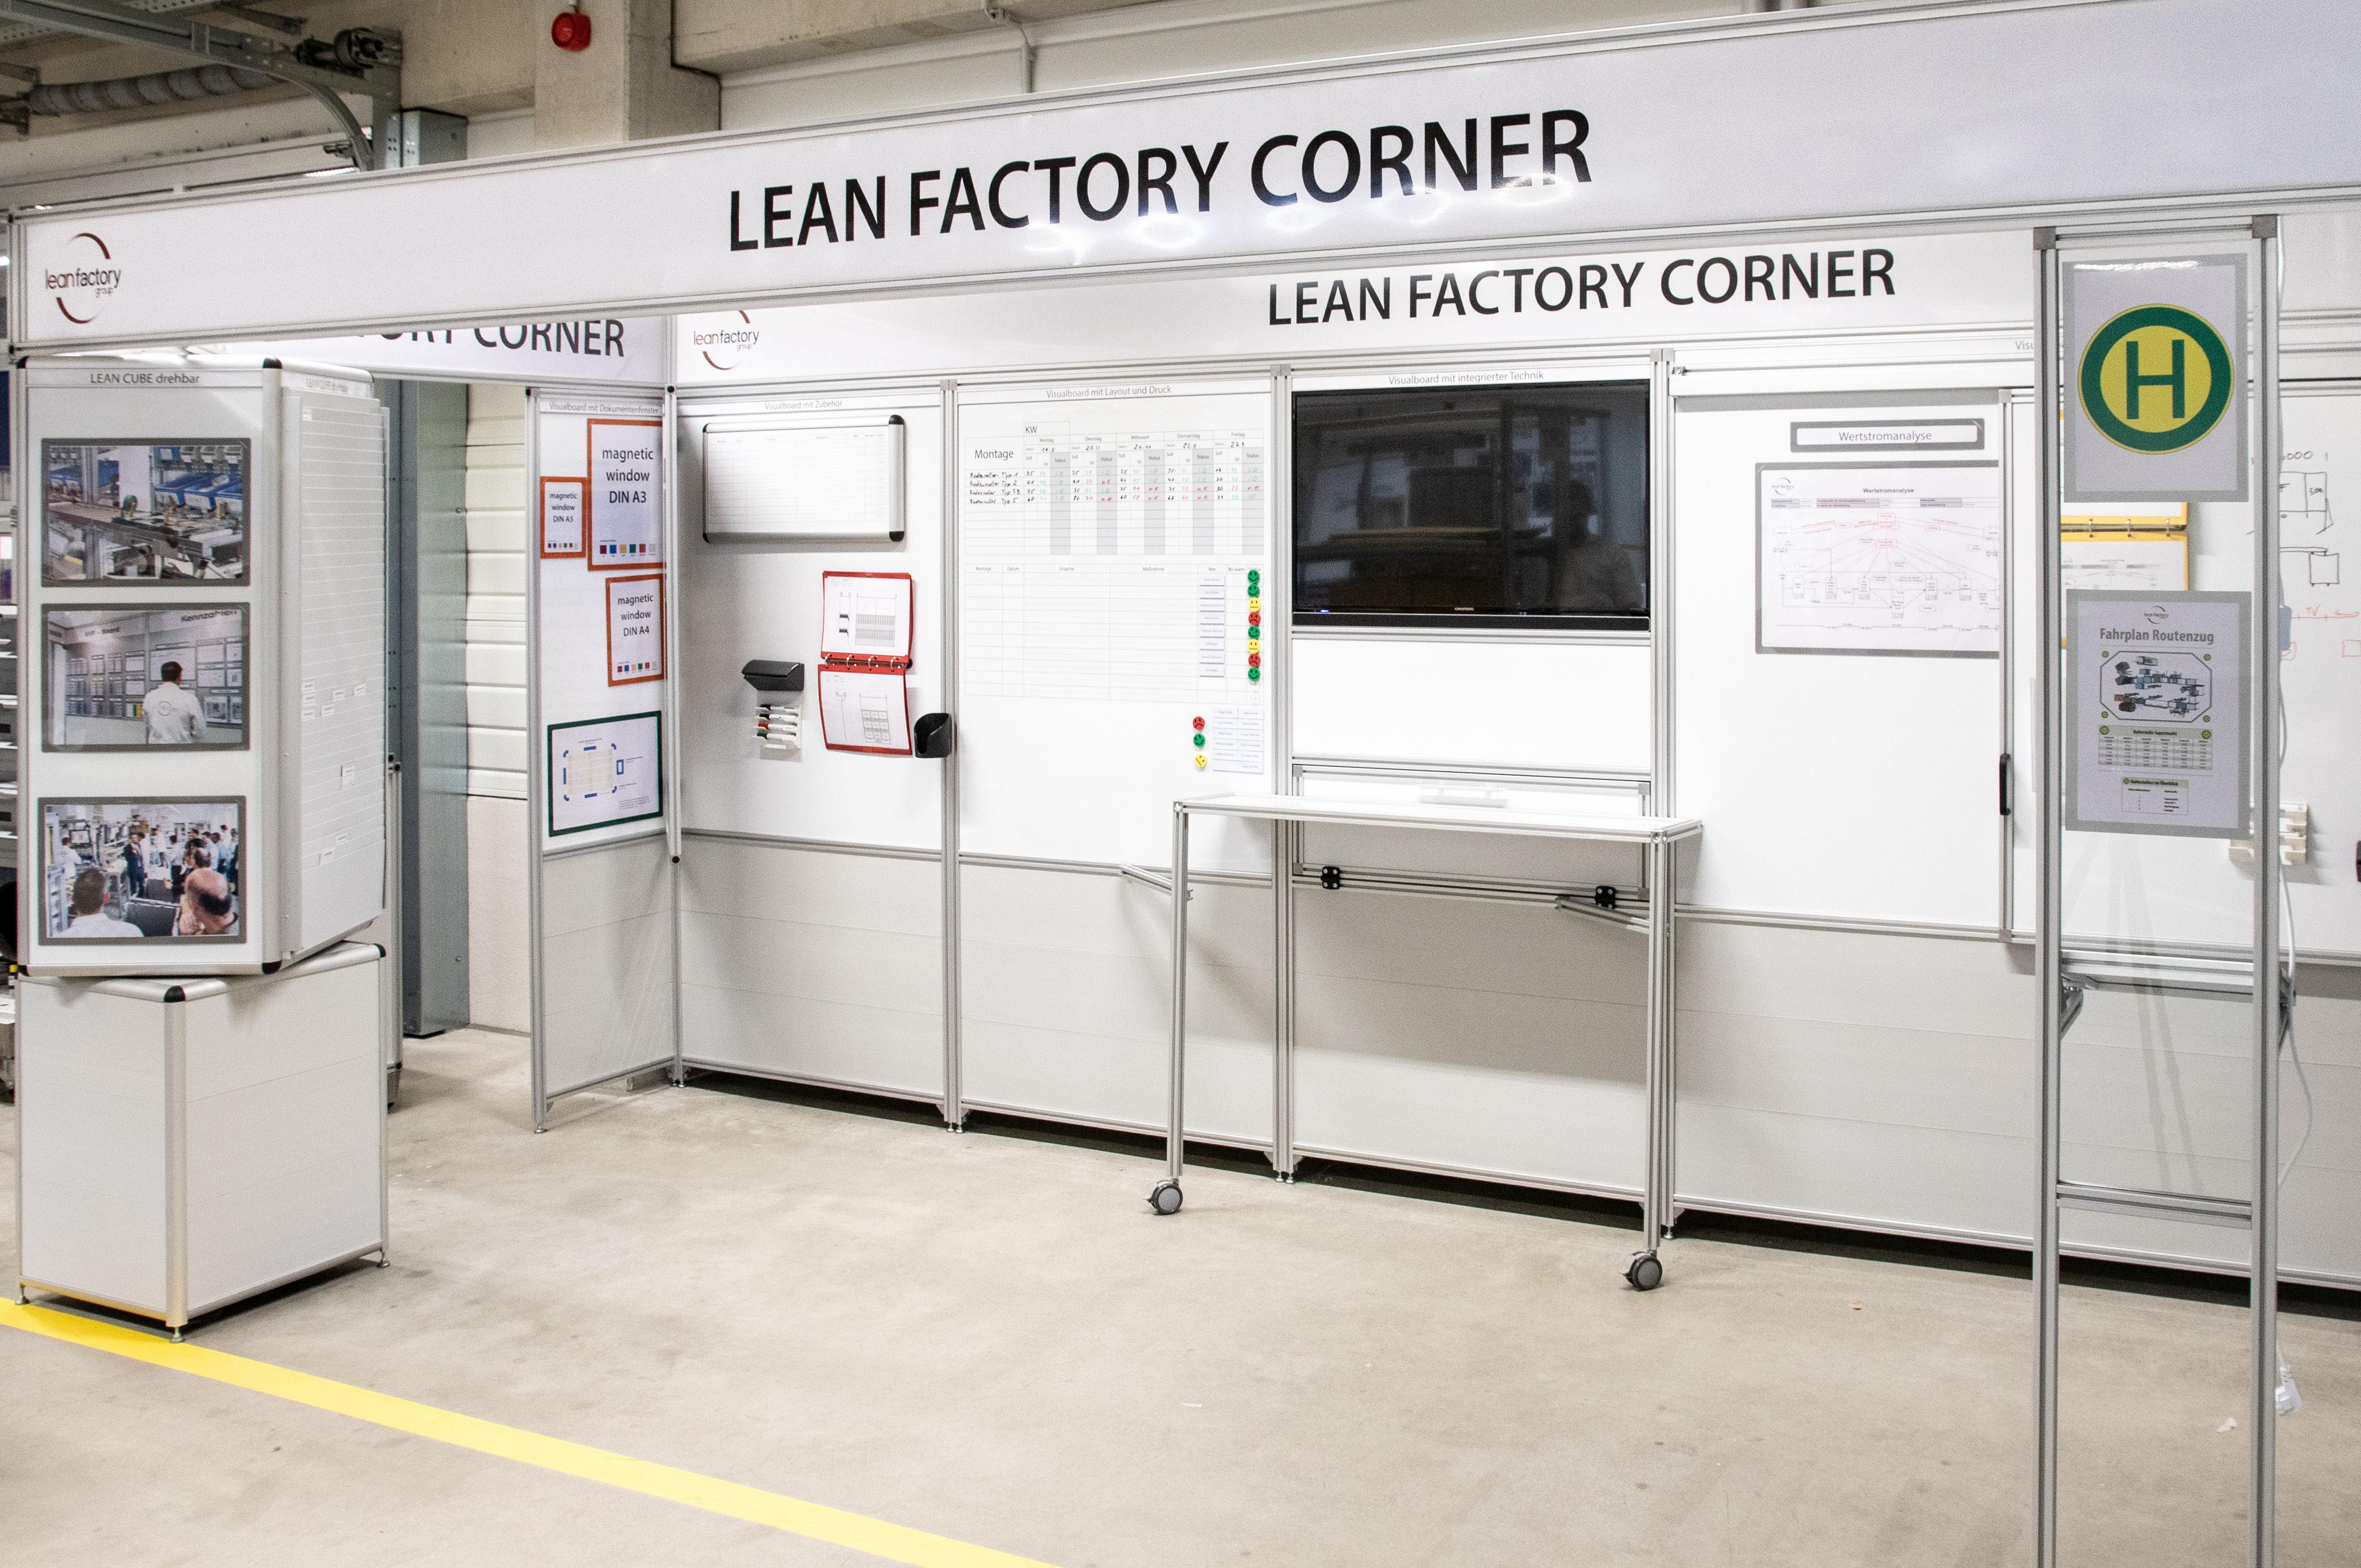 Lean factory corner